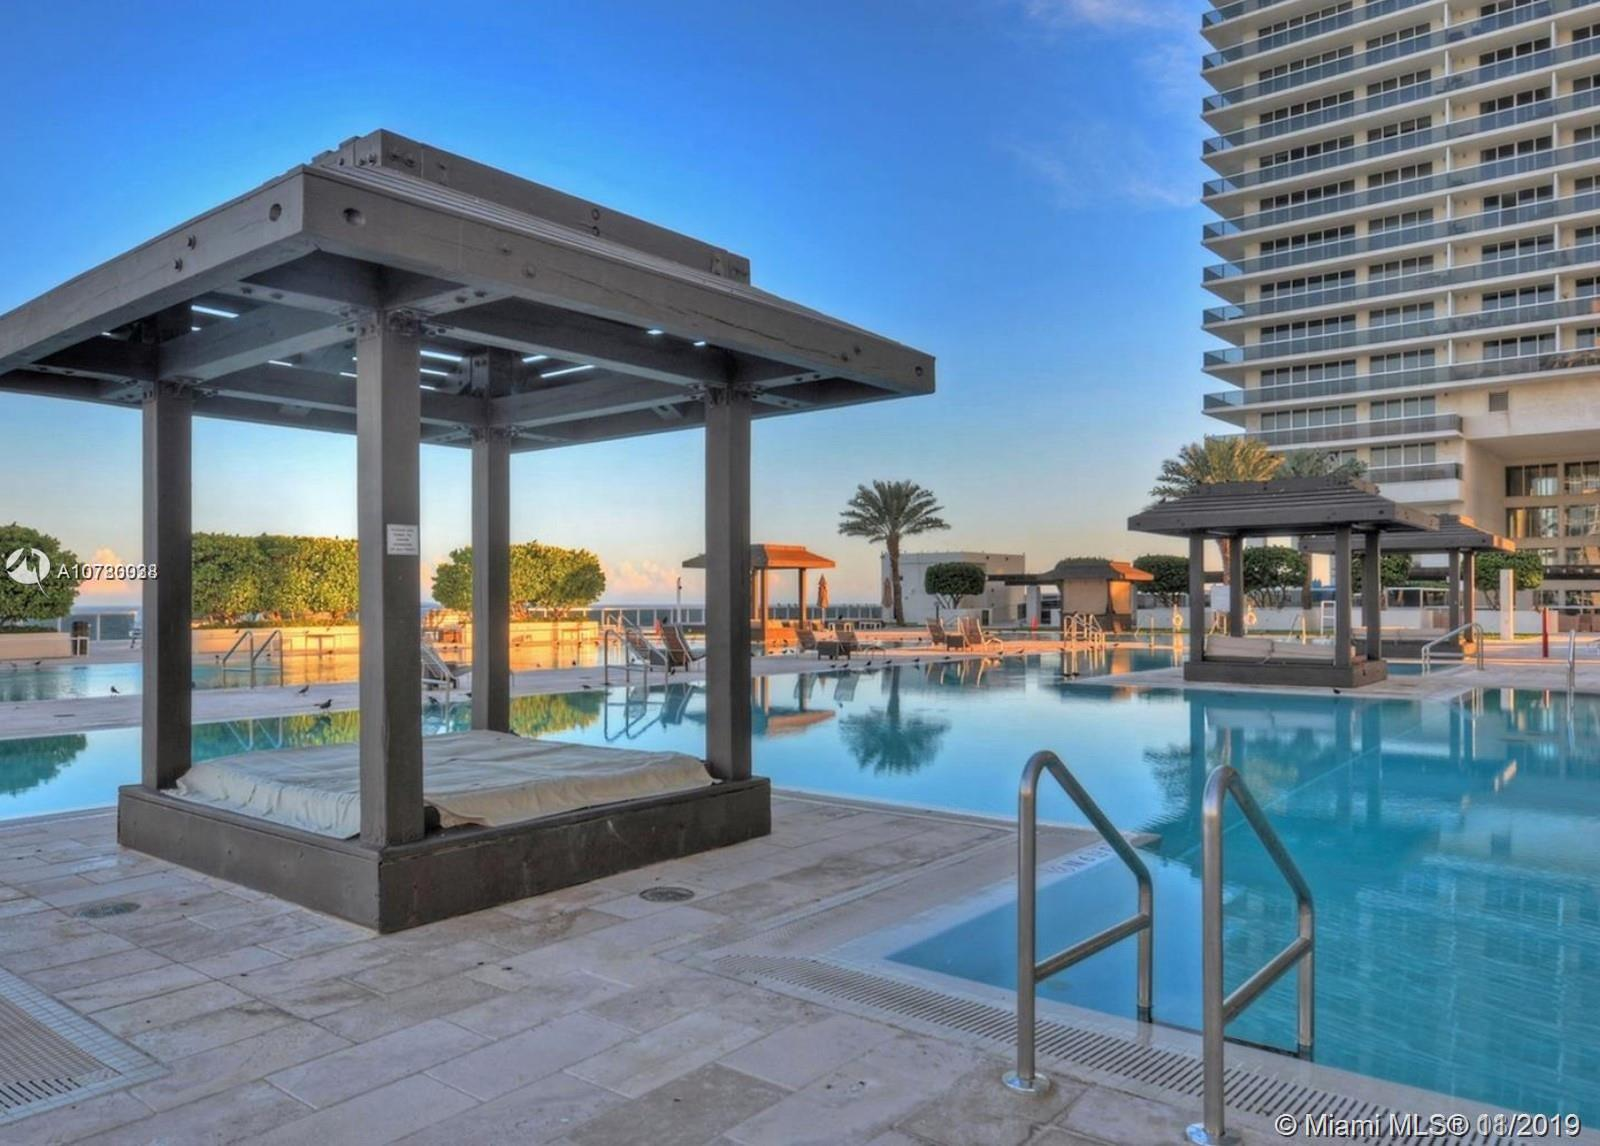 1830 S Ocean Dr # 2807, Hallandale Beach, Florida 33009, 1 Bedroom Bedrooms, ,1 BathroomBathrooms,Residential,For Sale,1830 S Ocean Dr # 2807,A10780038